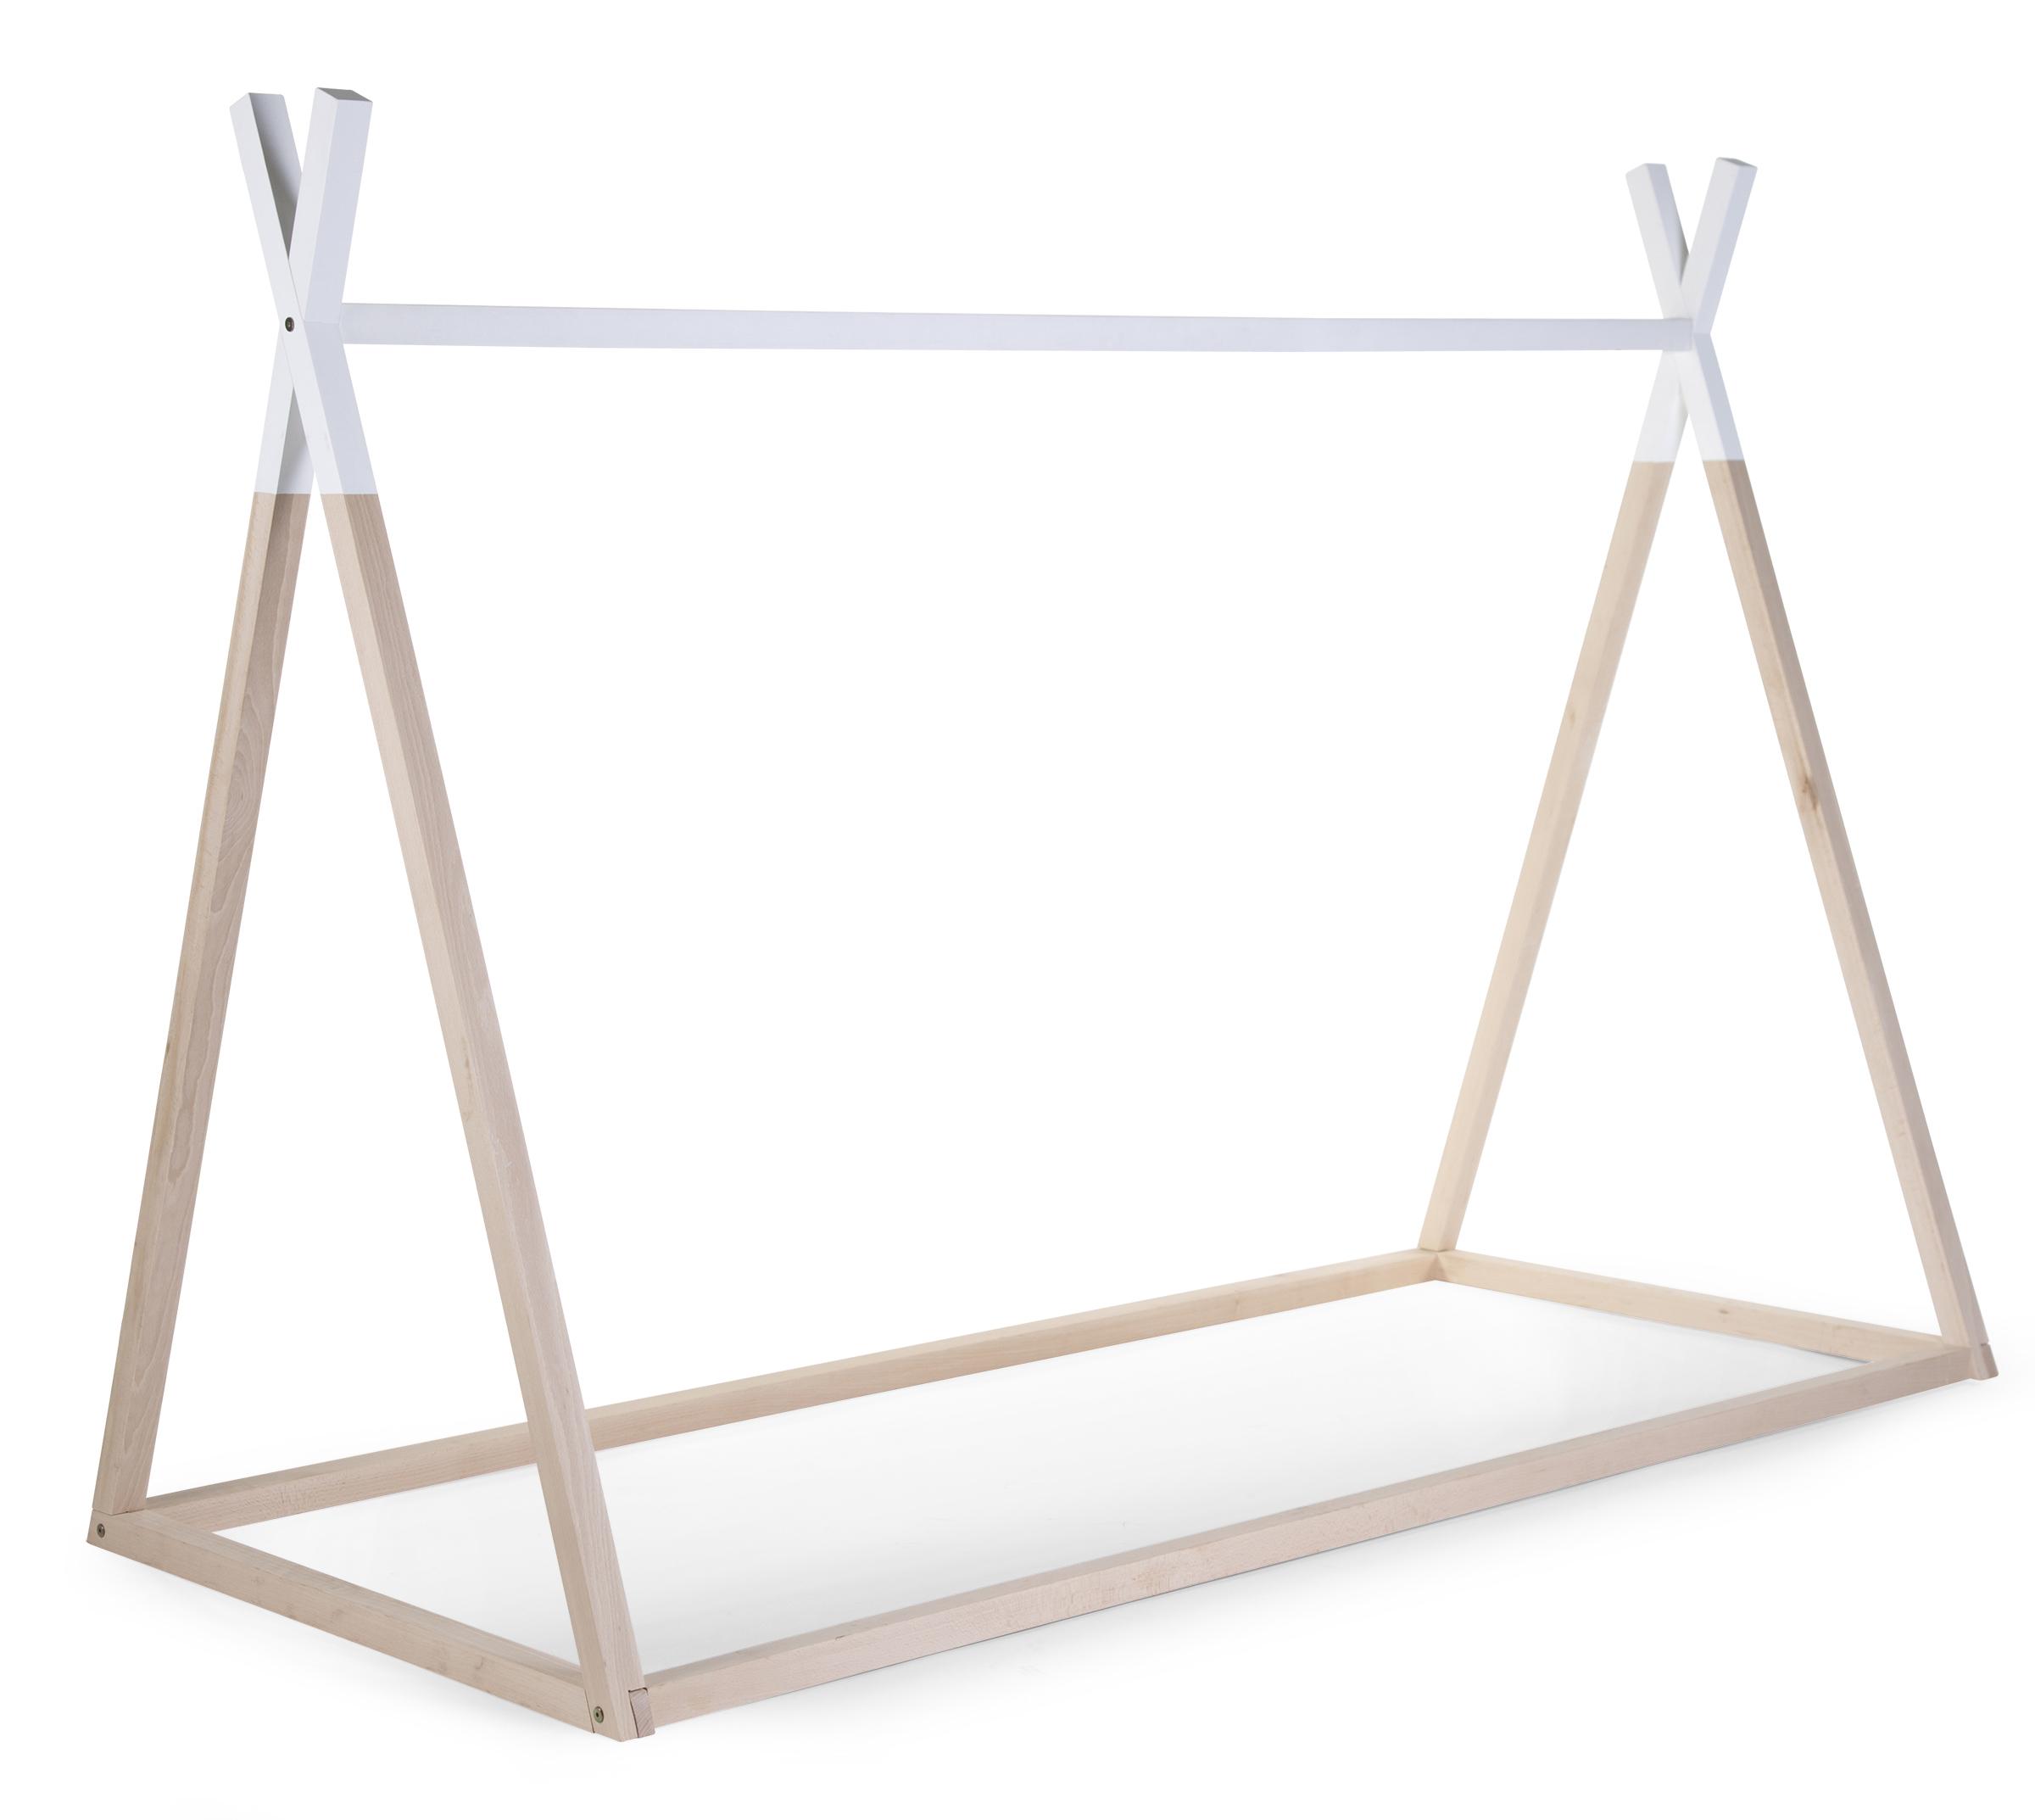 Childhome - Rama do łóżka Tipi 90 x 200 cm - Esy Floresy